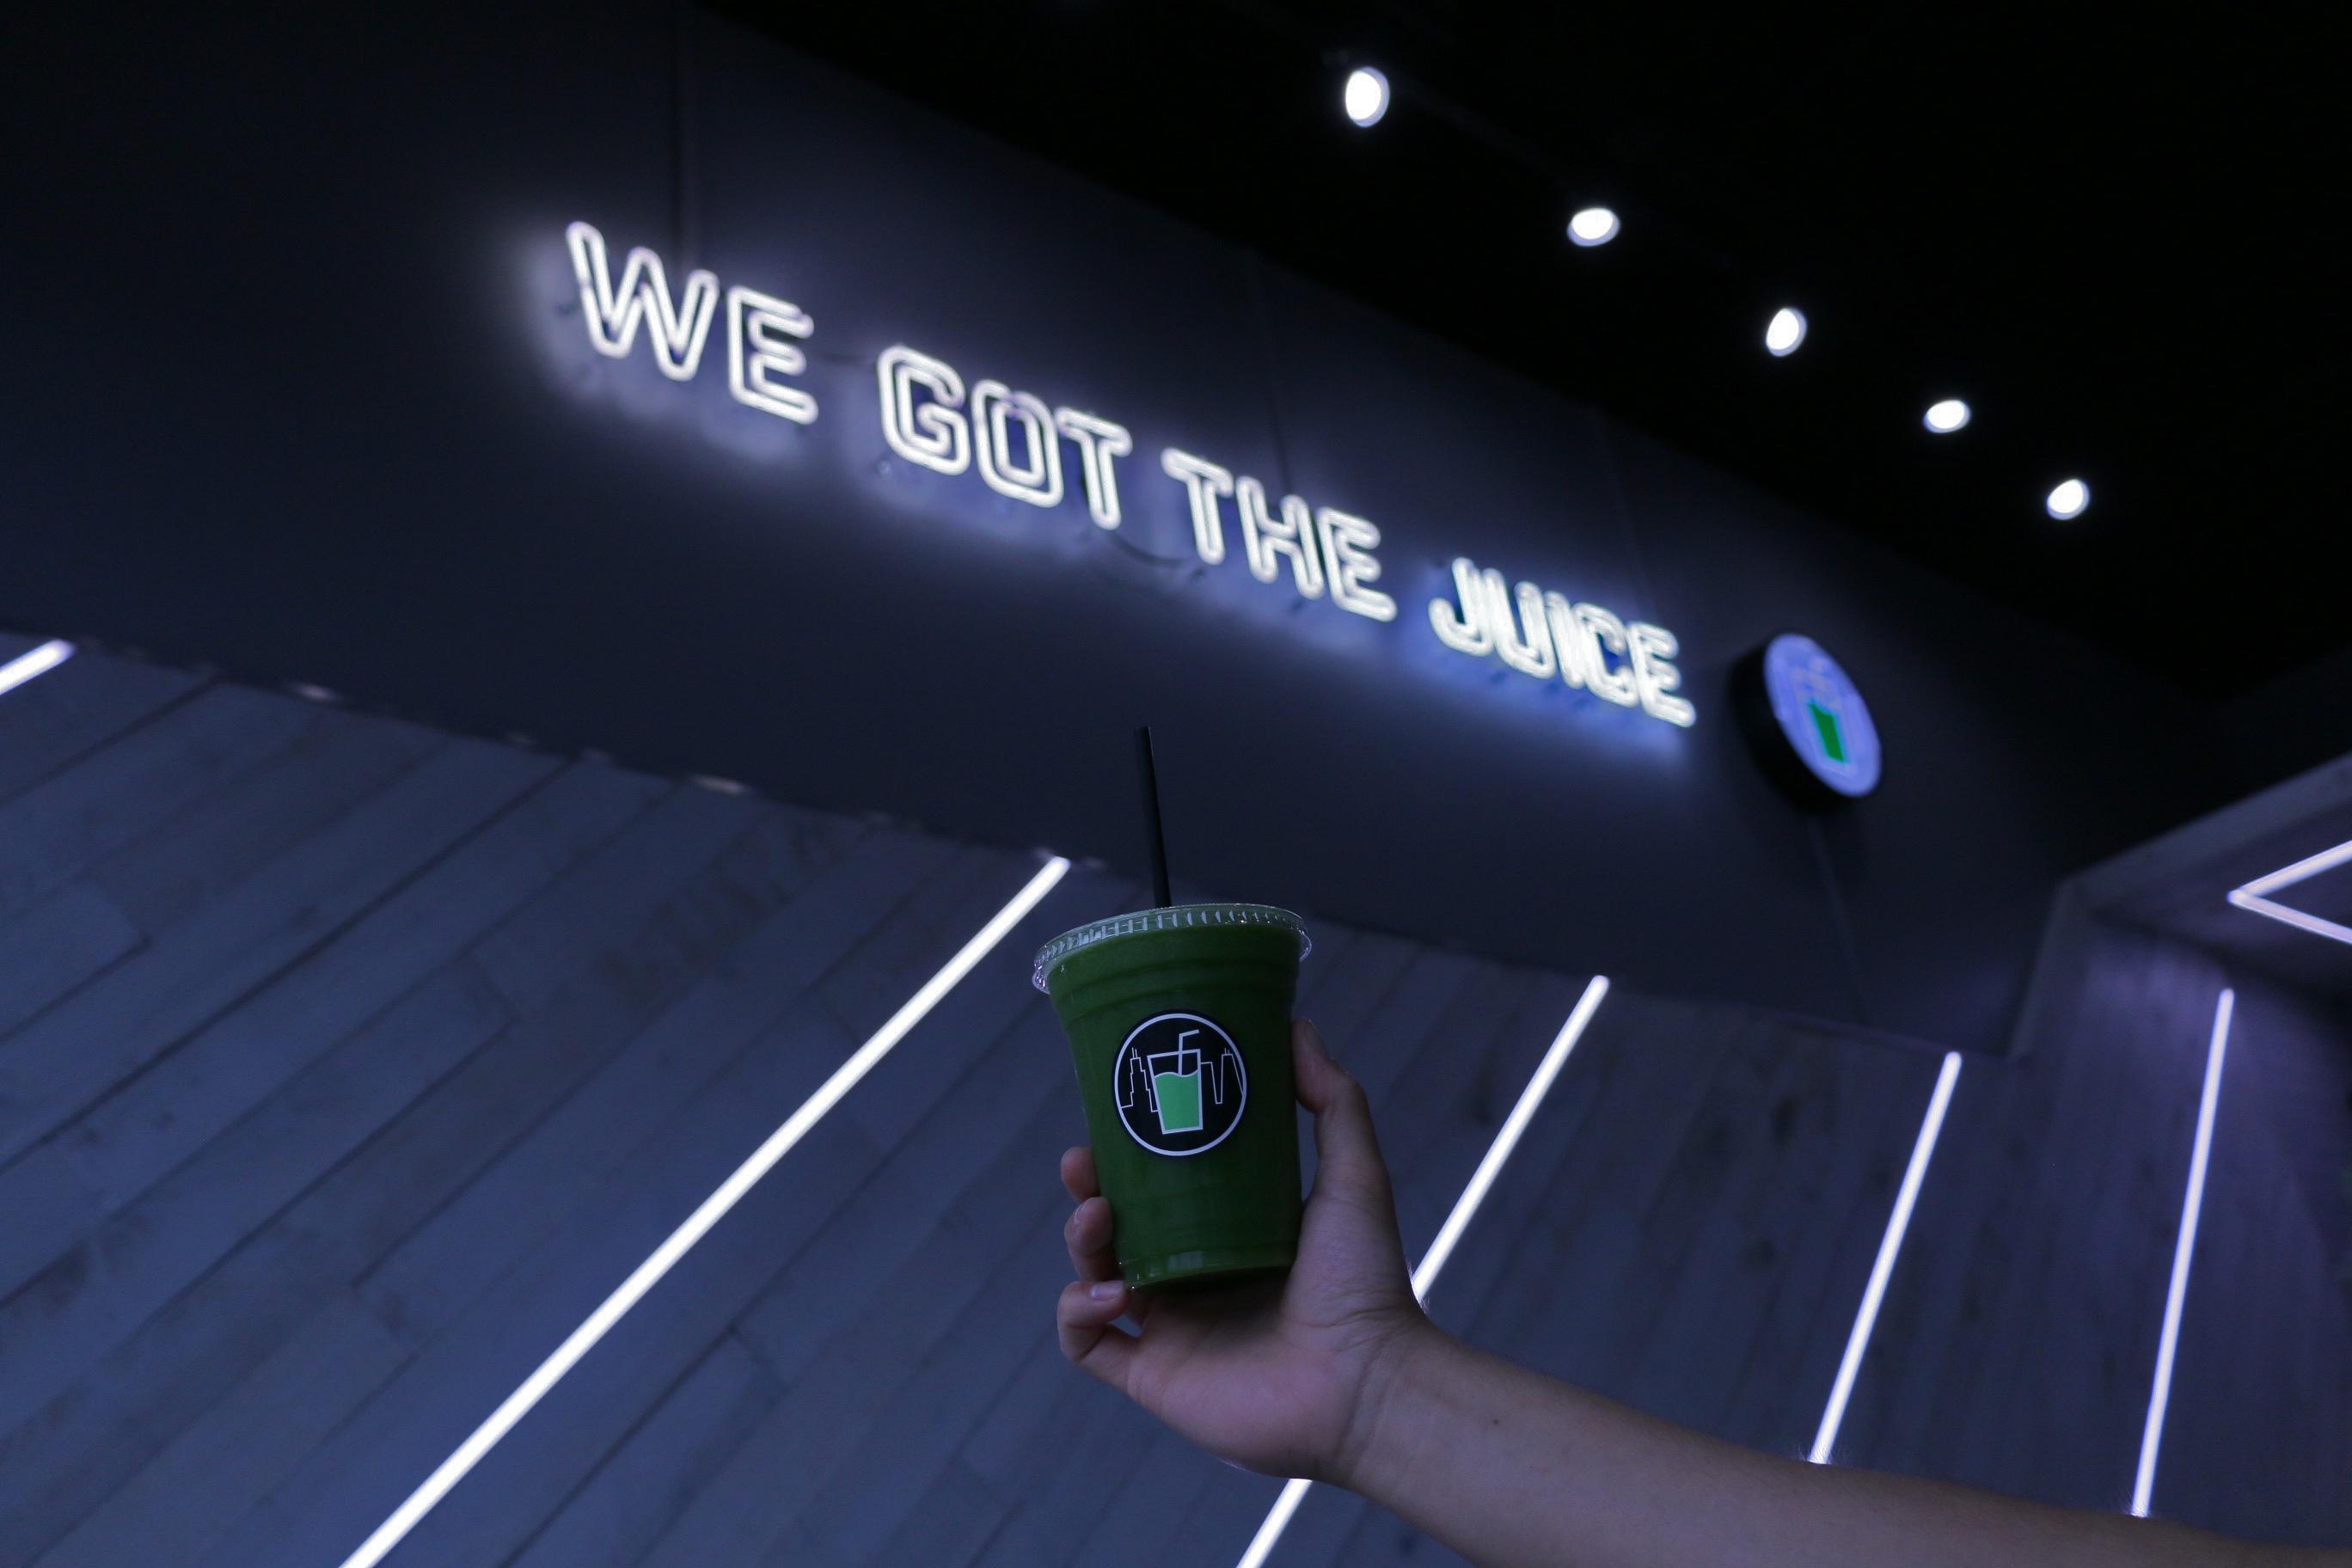 we-got-the-juice.jpg?fit=2736%2C1824&ssl=1